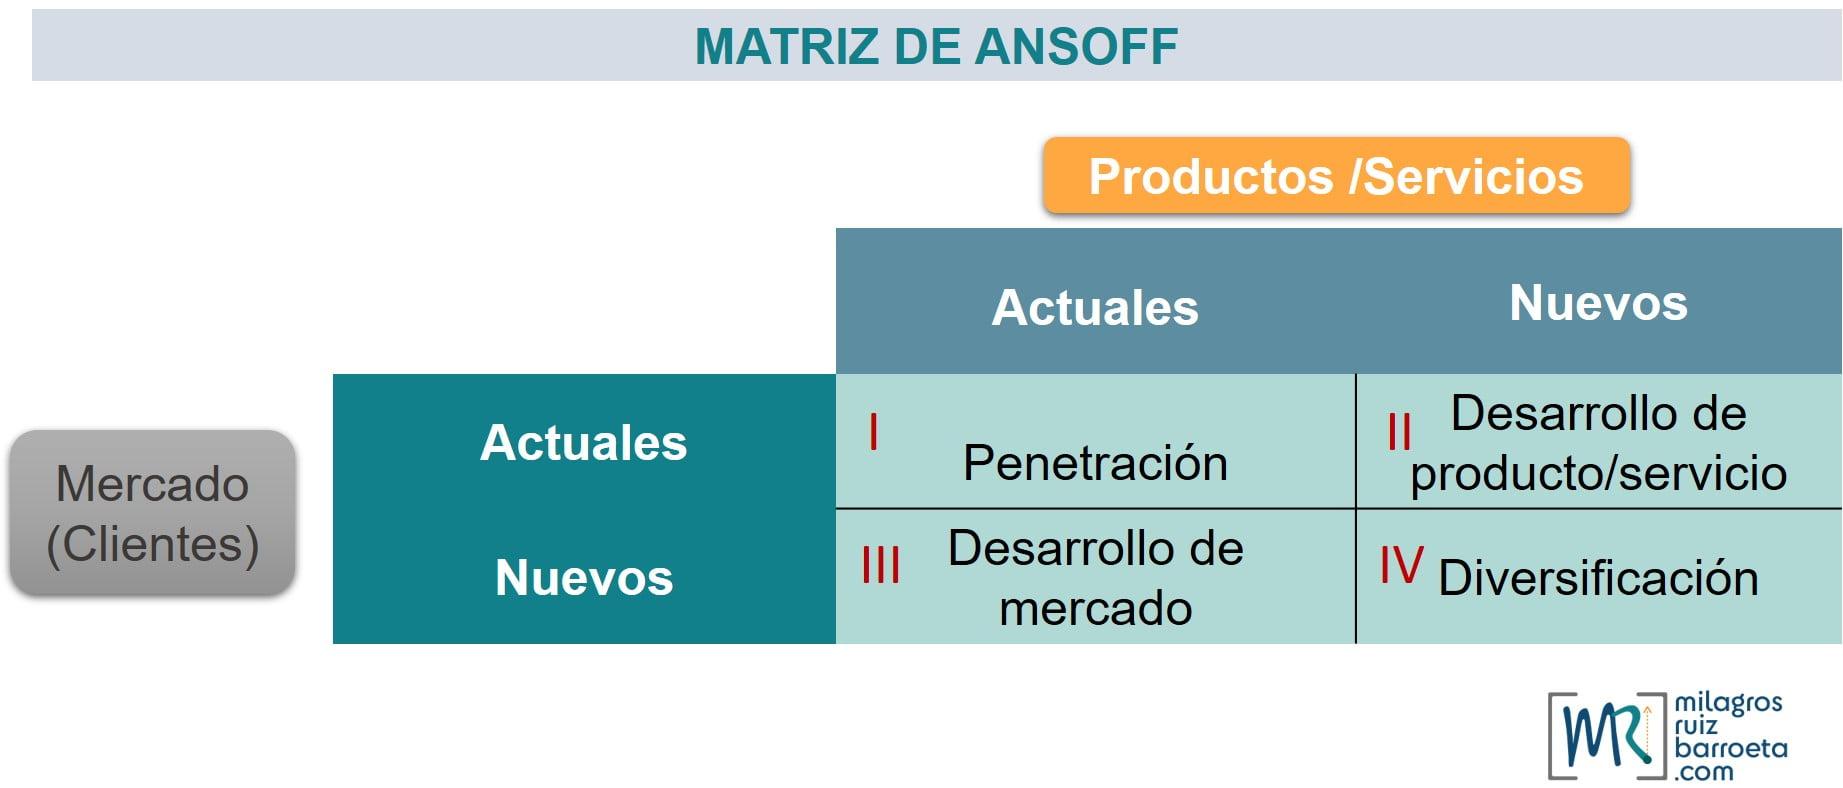 matriz-de-ansoff